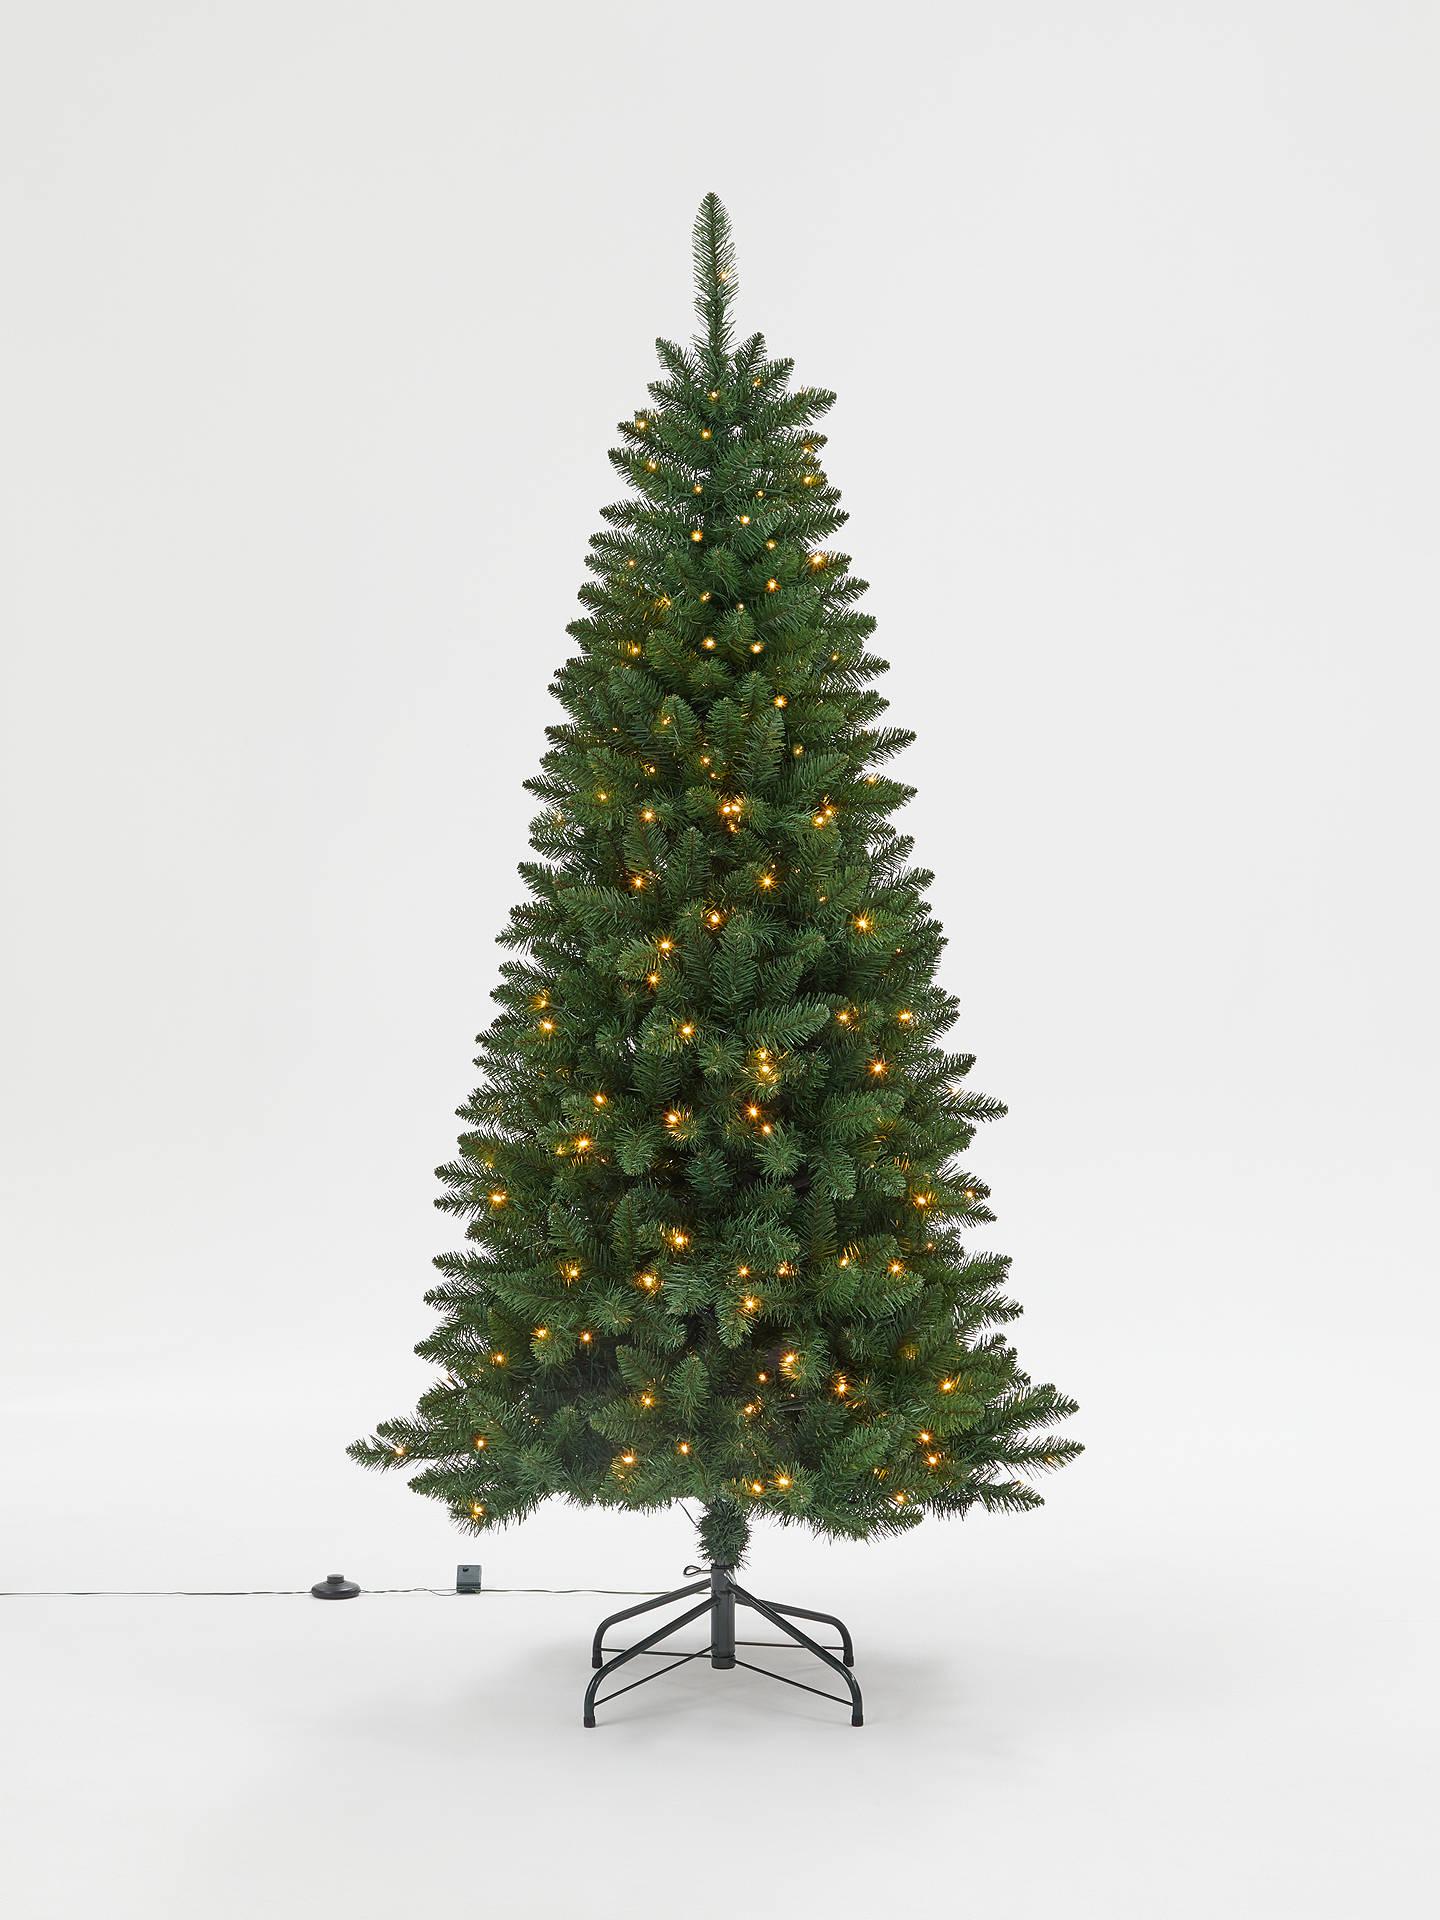 John Lewis & Partners Spire Spruce Pre-lit Christmas Tree, 6ft at John Lewis & Partners